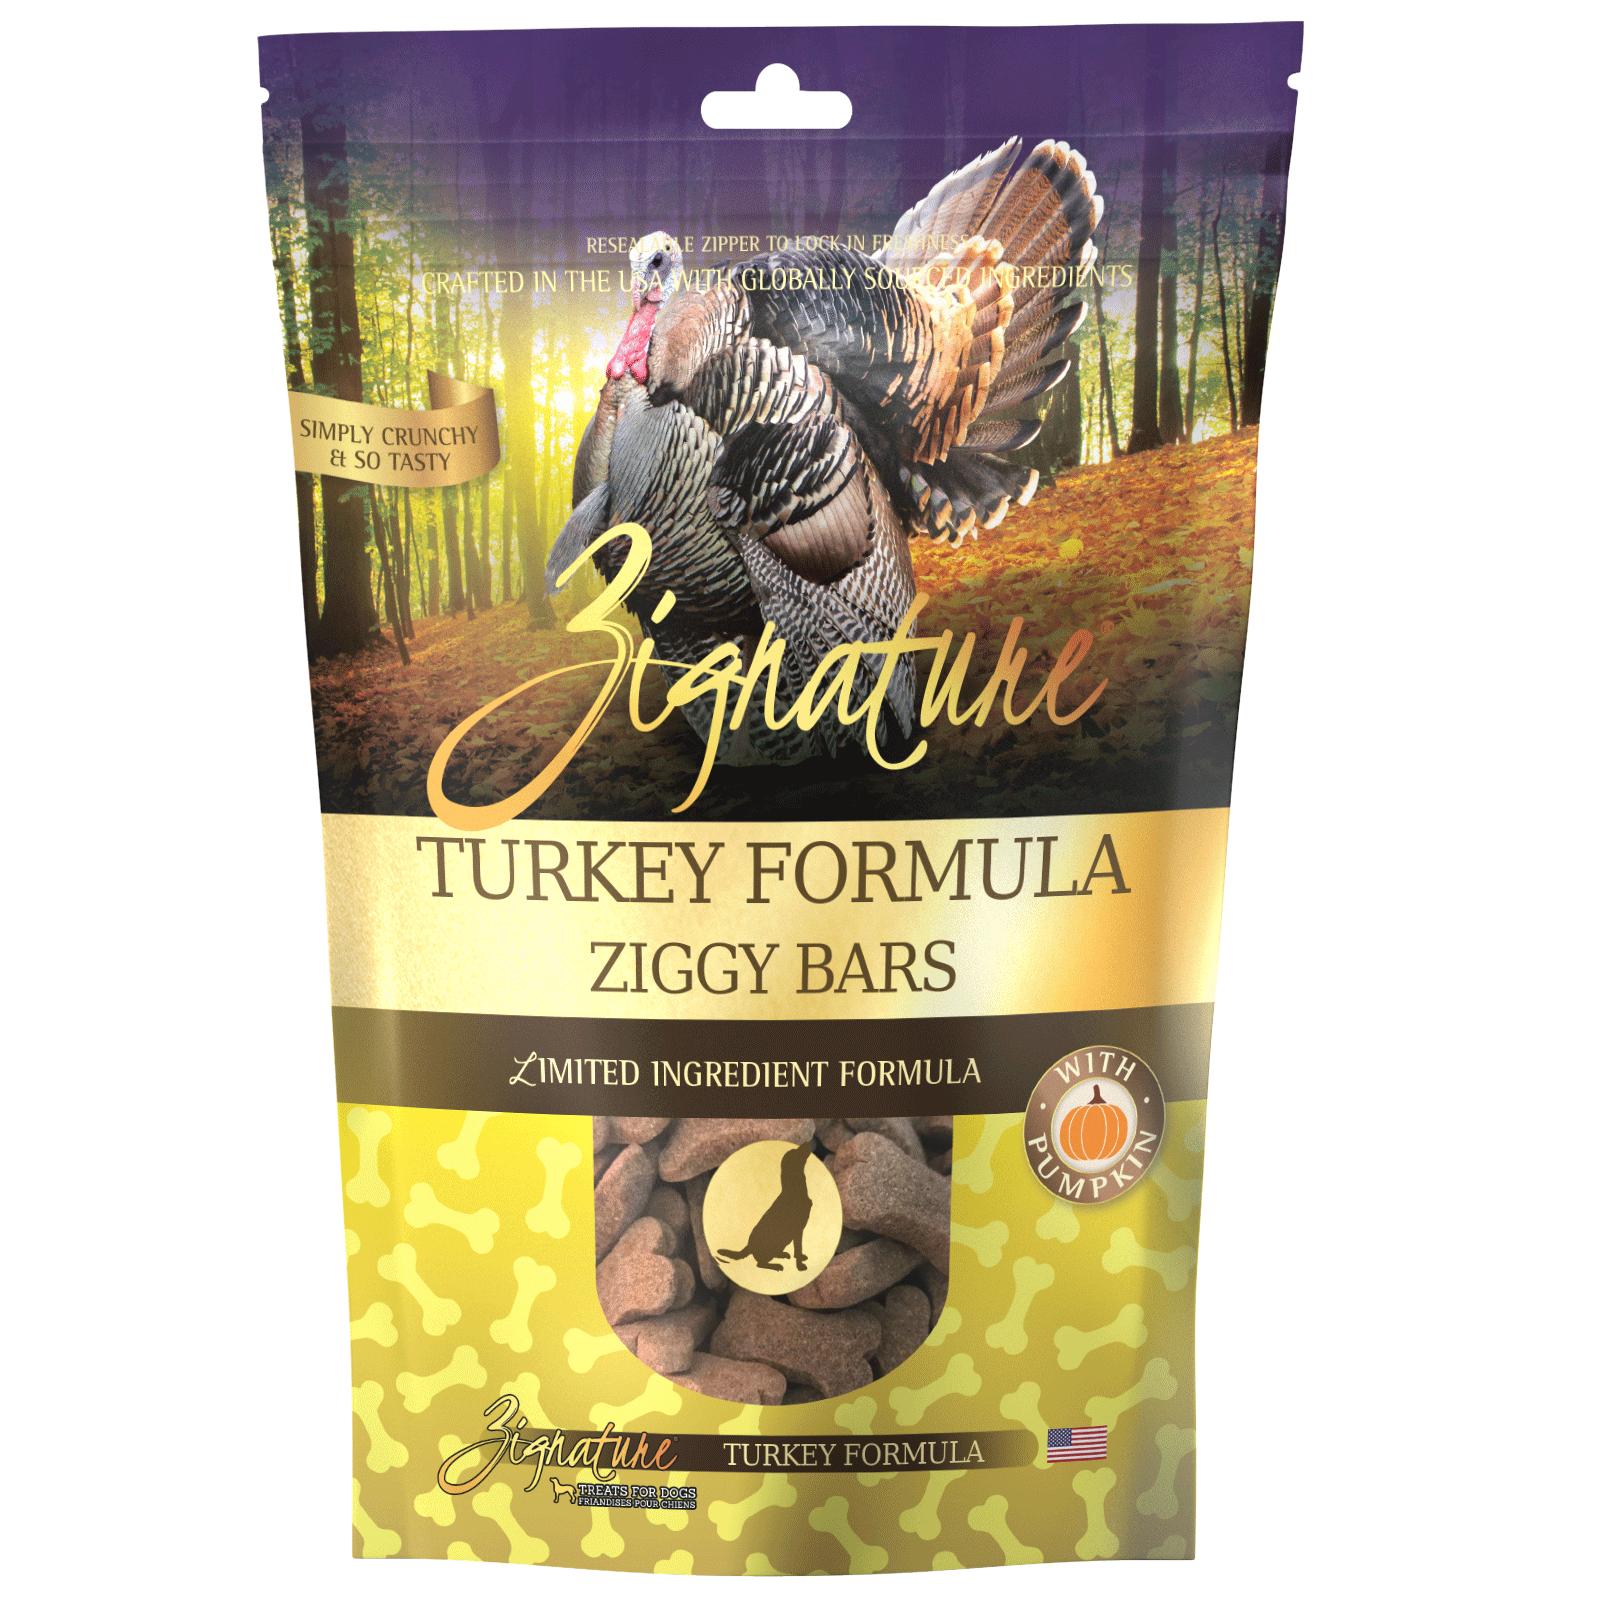 Zignature Turkey Formula Biscuit Treats for Dogs